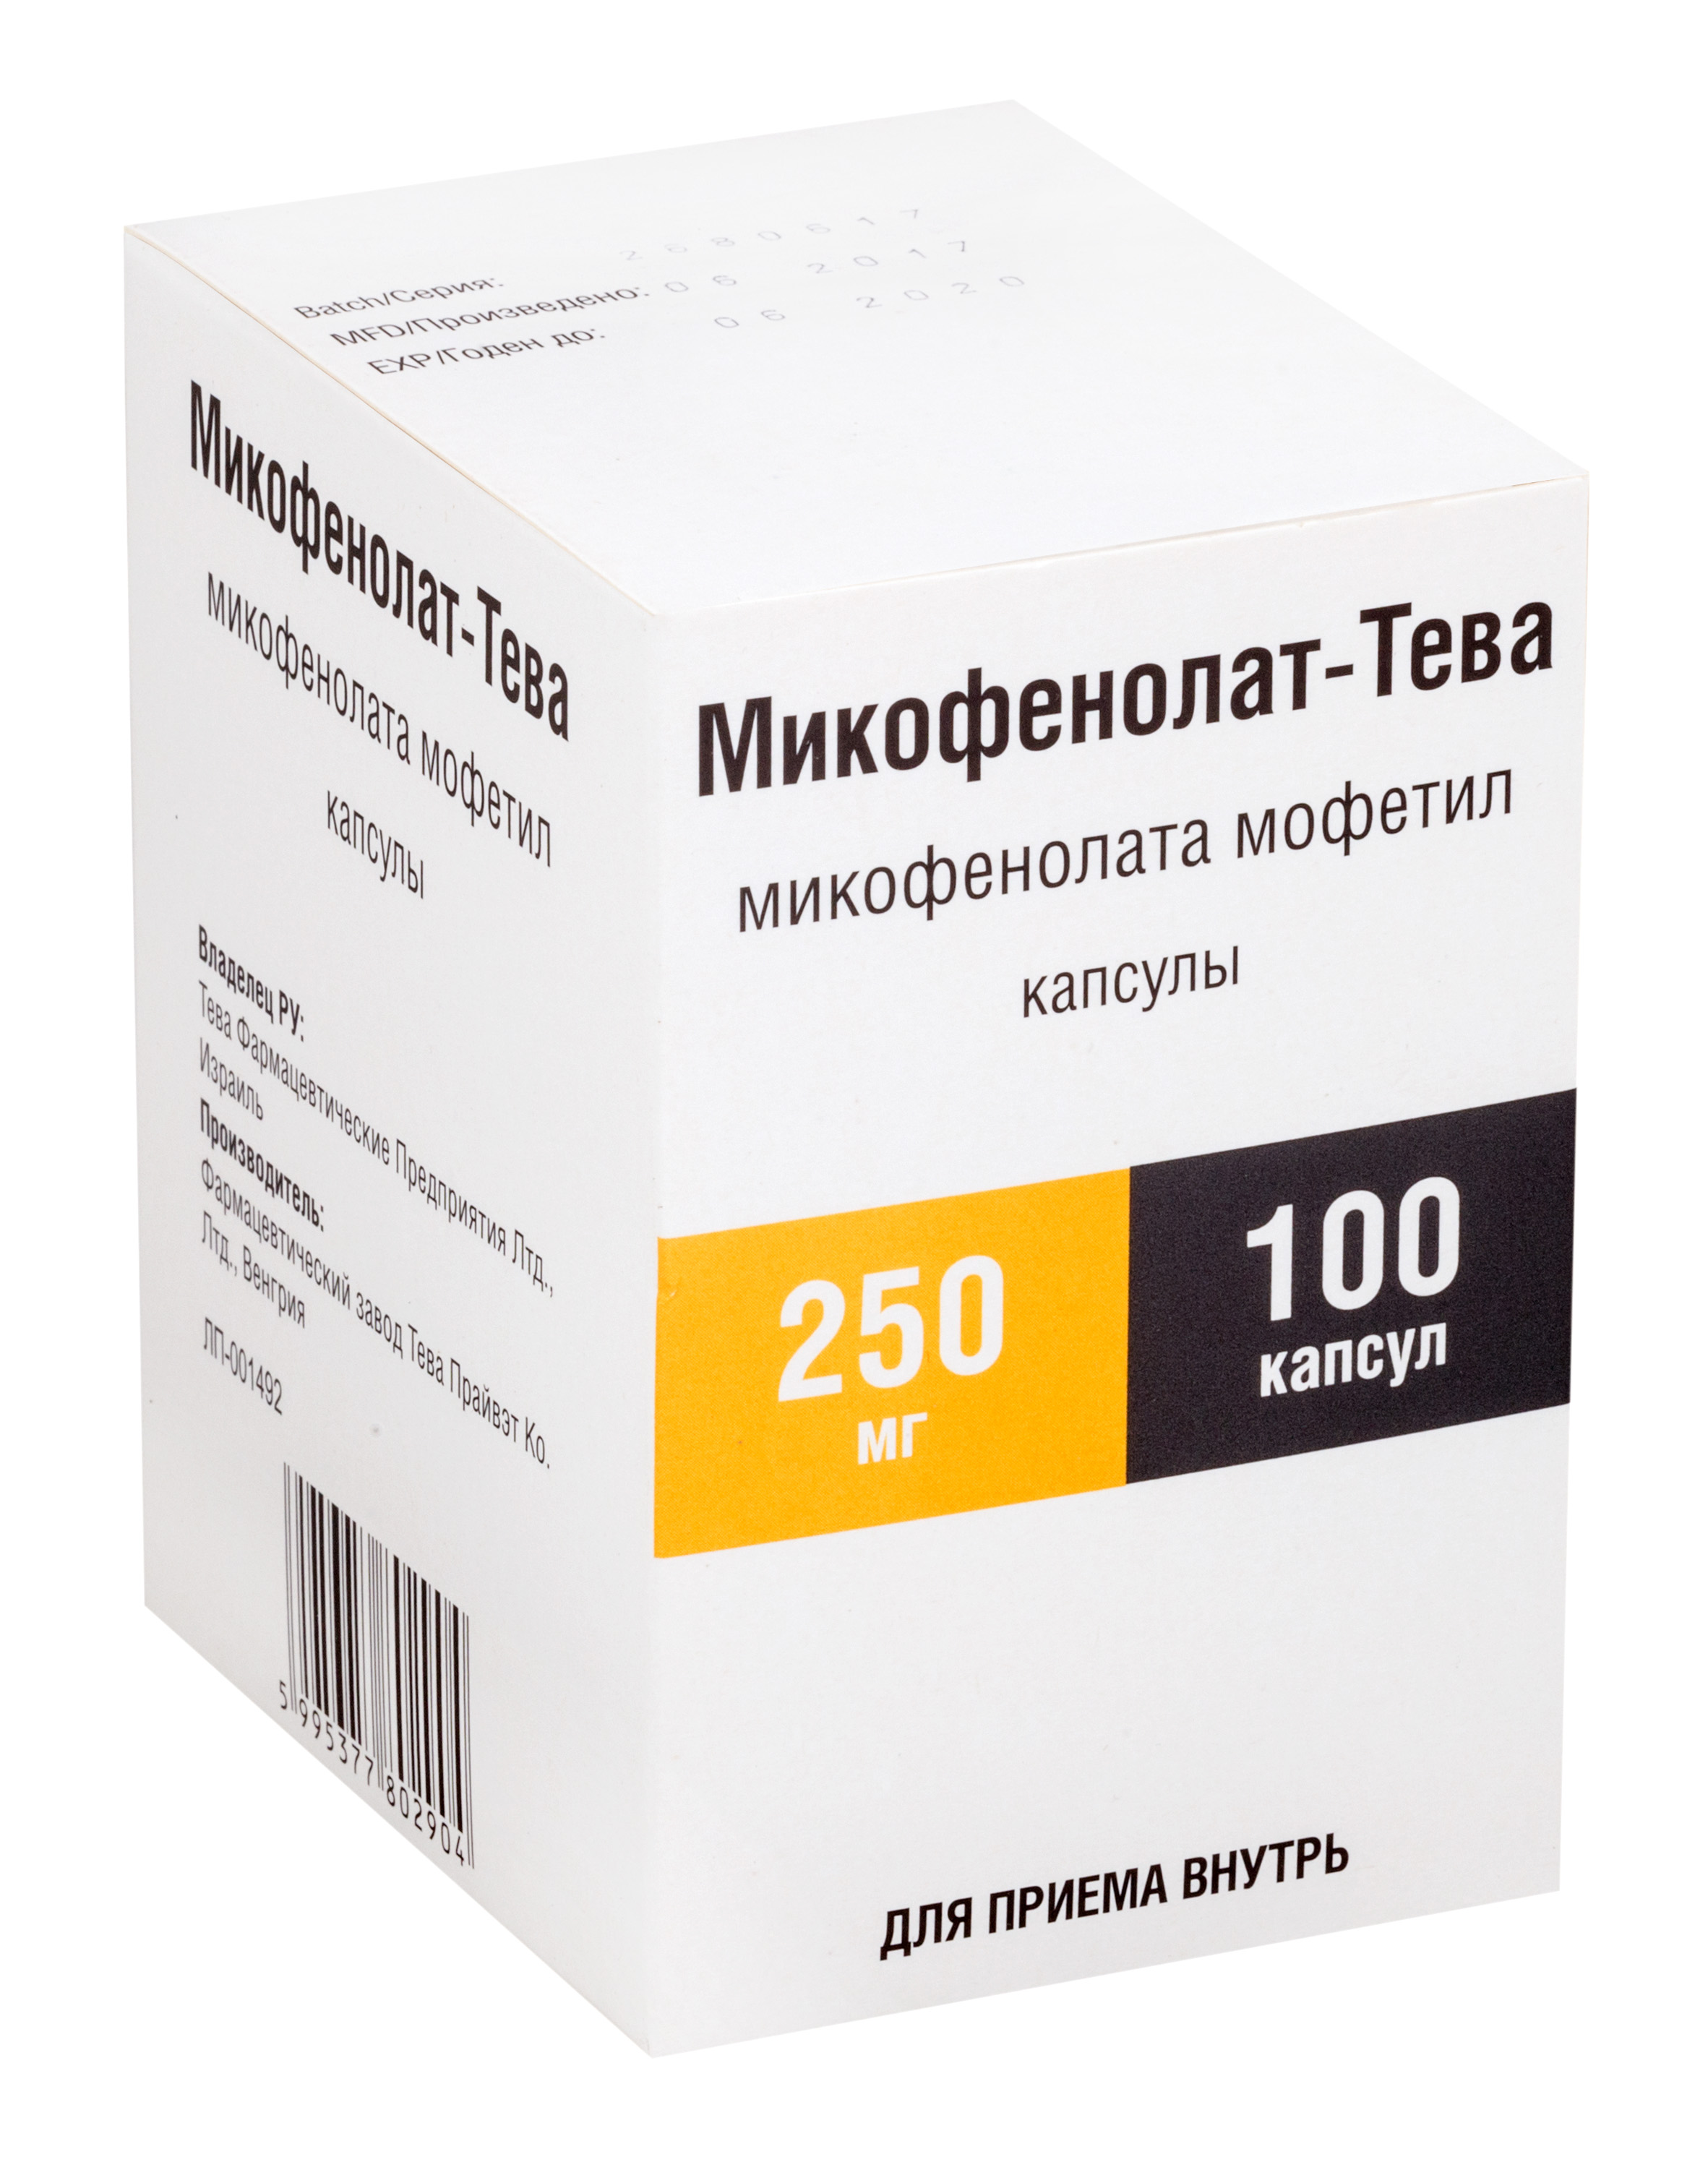 Микофенолат-тева капс. 250мг n100